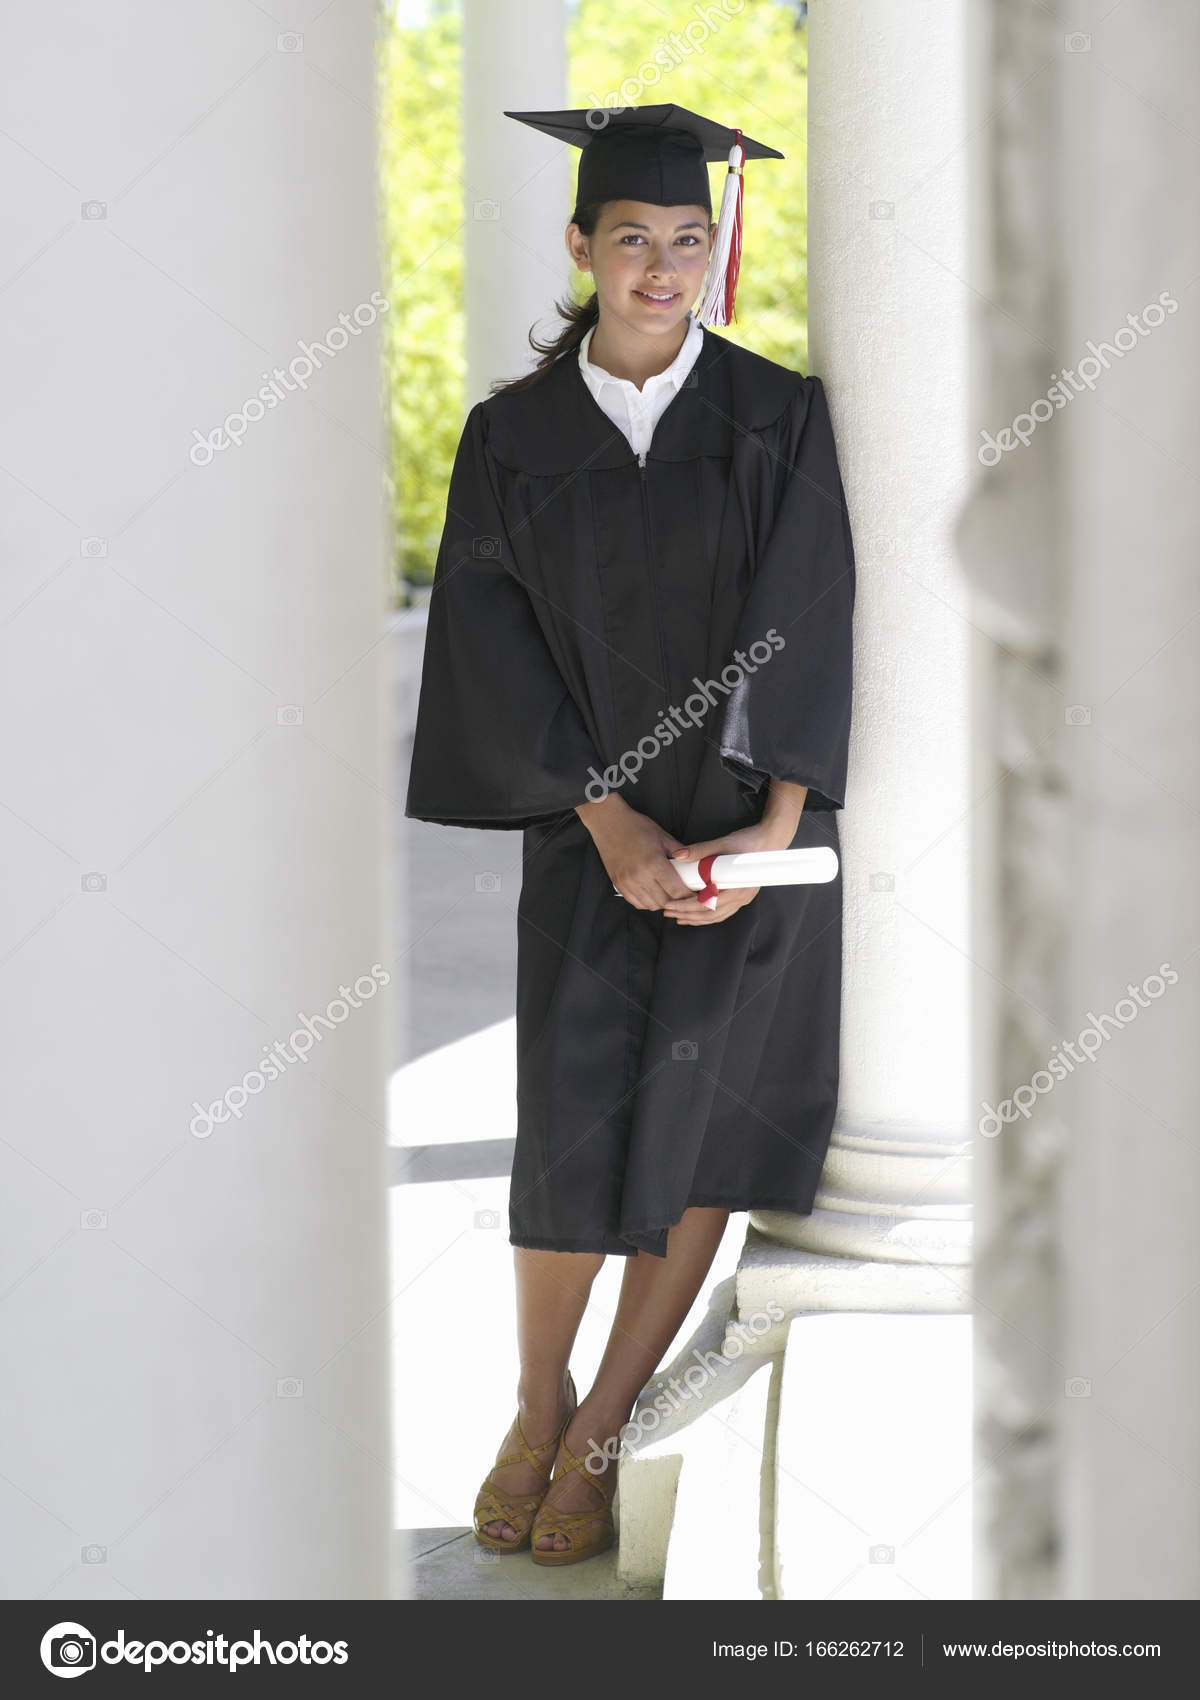 University Student Graduation Gown Mortar Board Holding Diploma ...